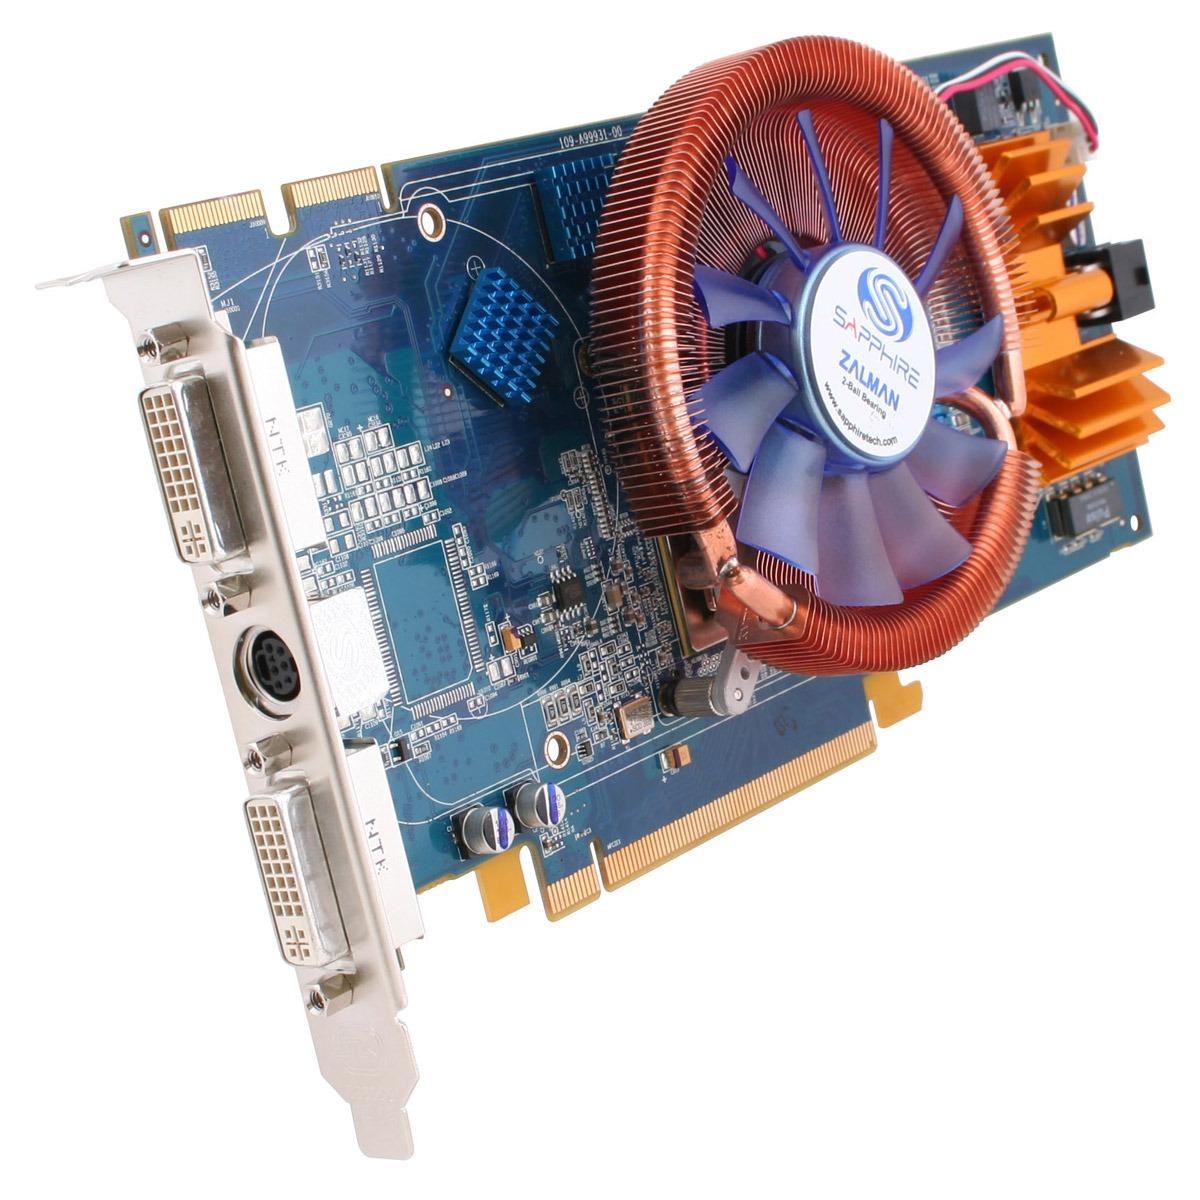 Carte graphique Sapphire Radeon Ultimate X1950 Pro 256 MB Sapphire Radeon Ultimate X1950 Pro 256 MB - 256 Mo TV-Out/Dual DVI - PCI Express (ATI Radon X1950 Pro)